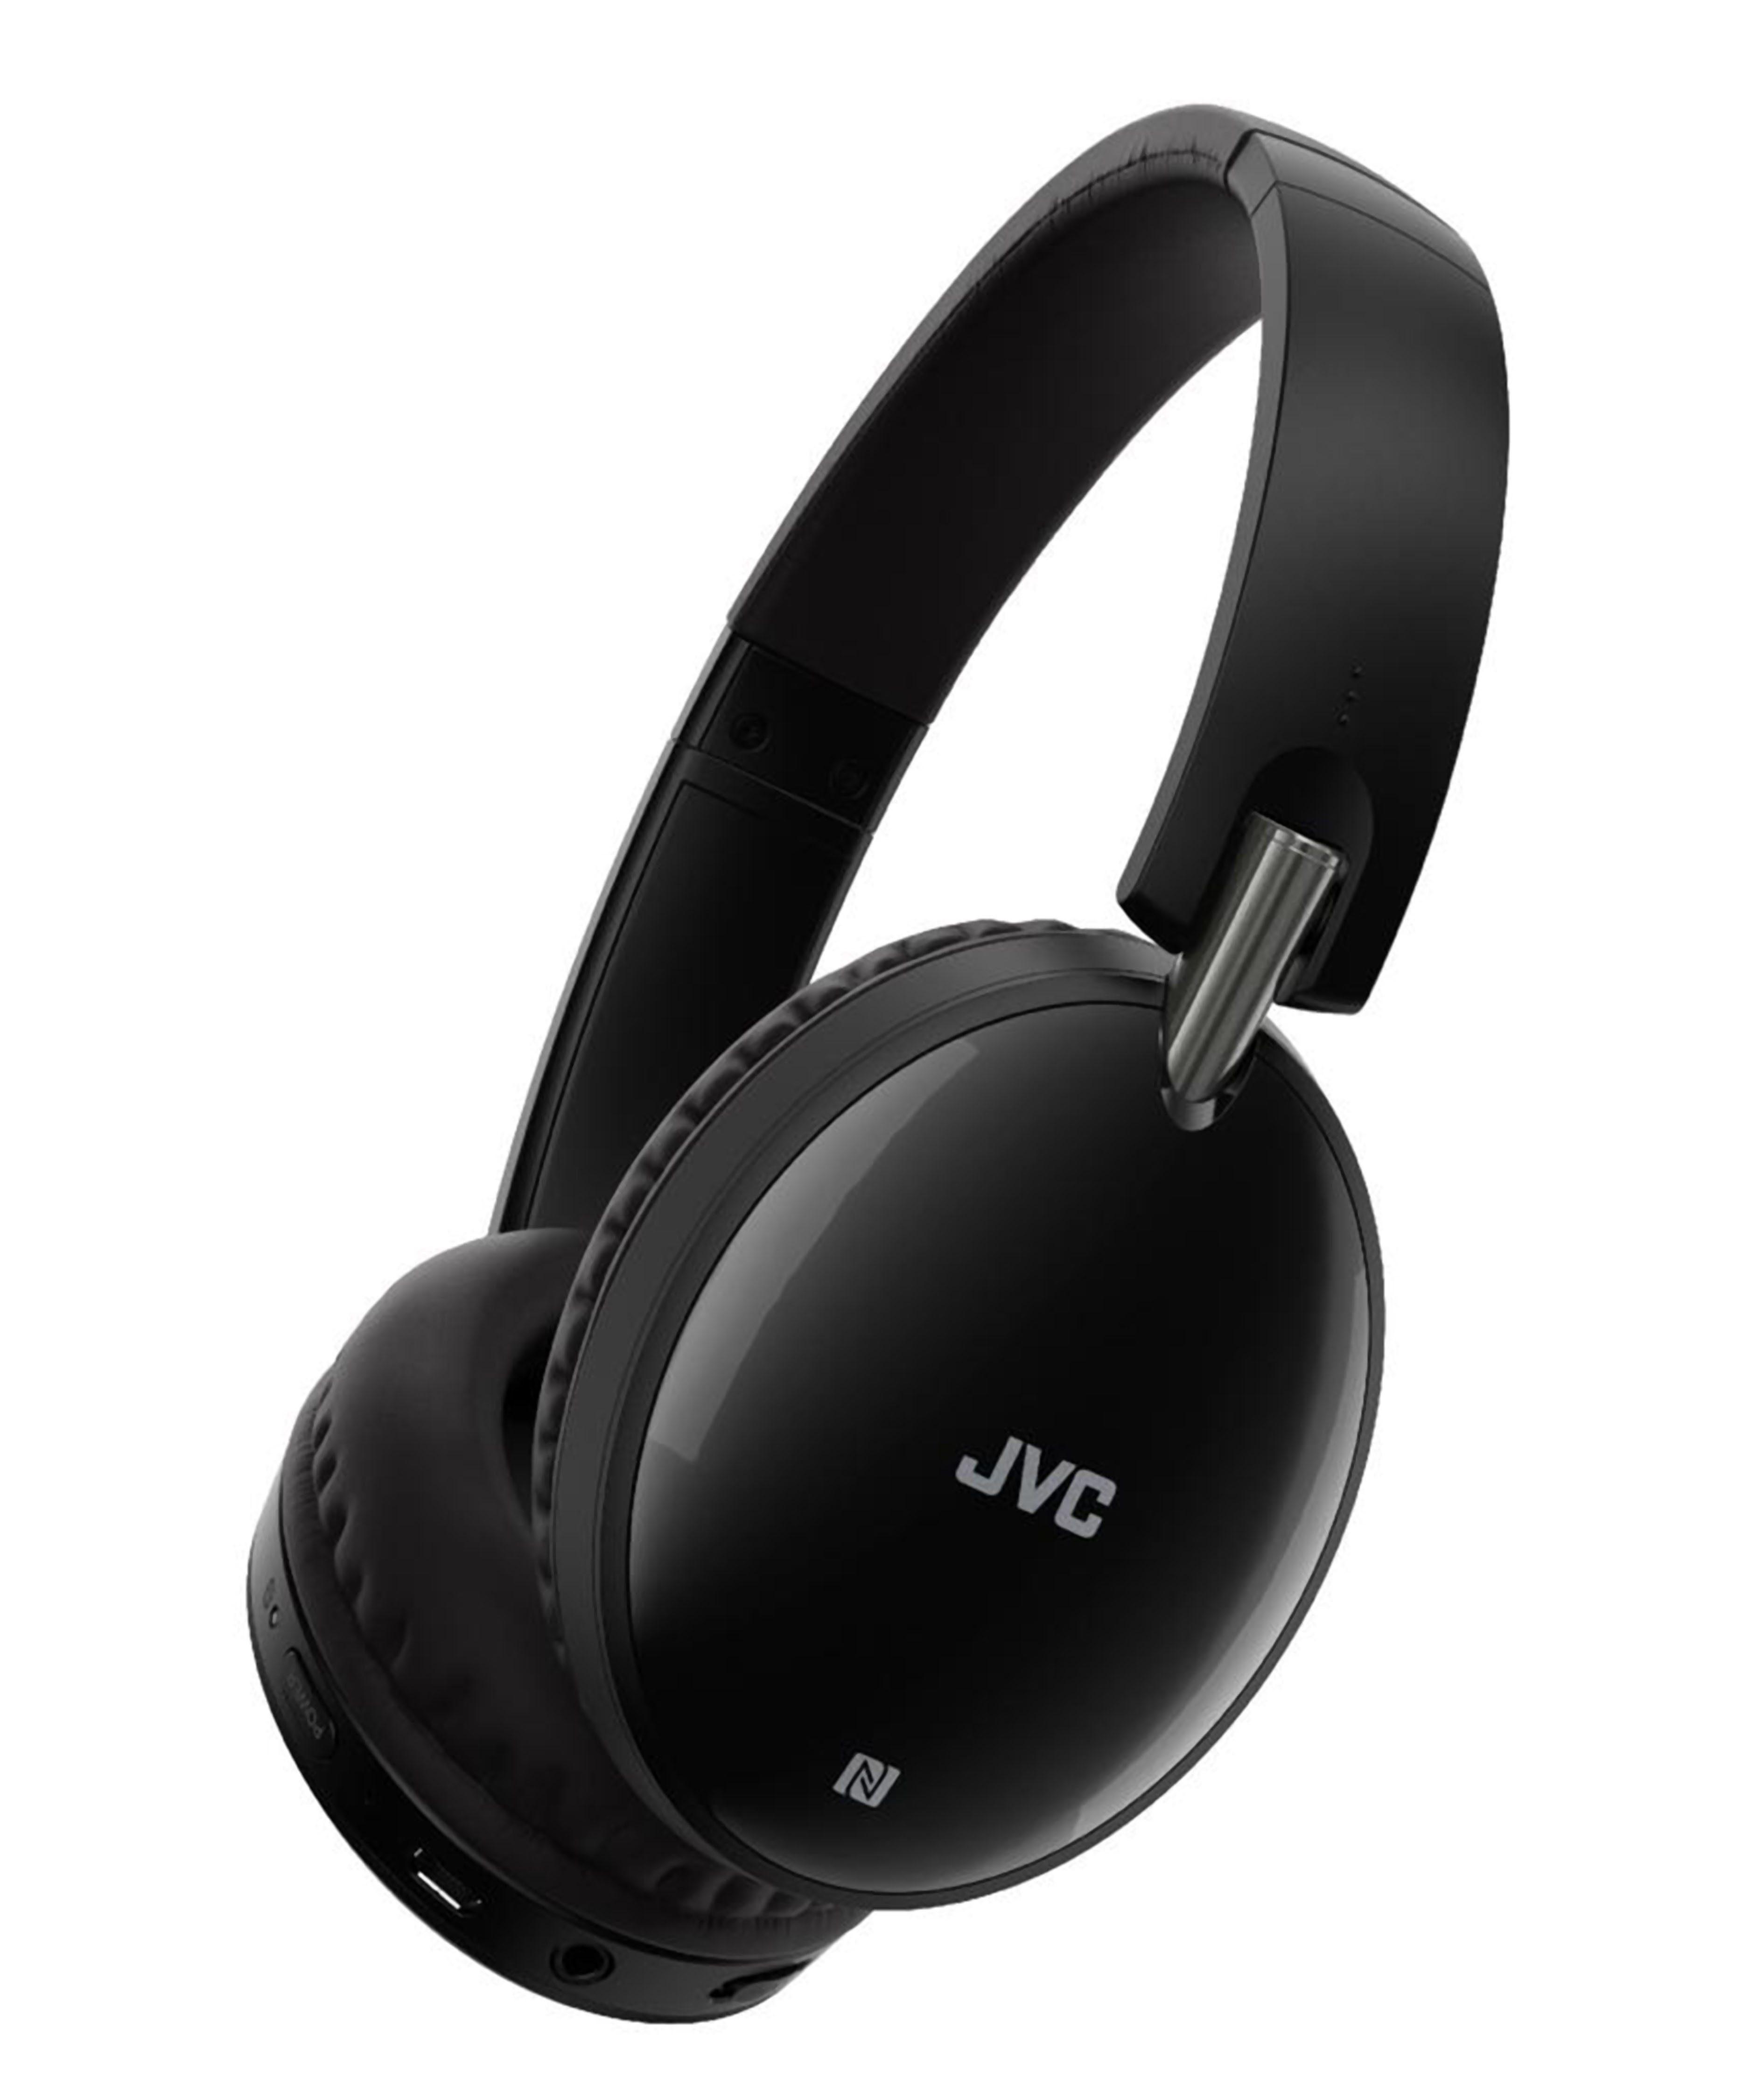 JVC On-Ear Bluetooth Kopfhörer, Headset-Funktion, faltbare Bauweise »HA-S70BT-E«